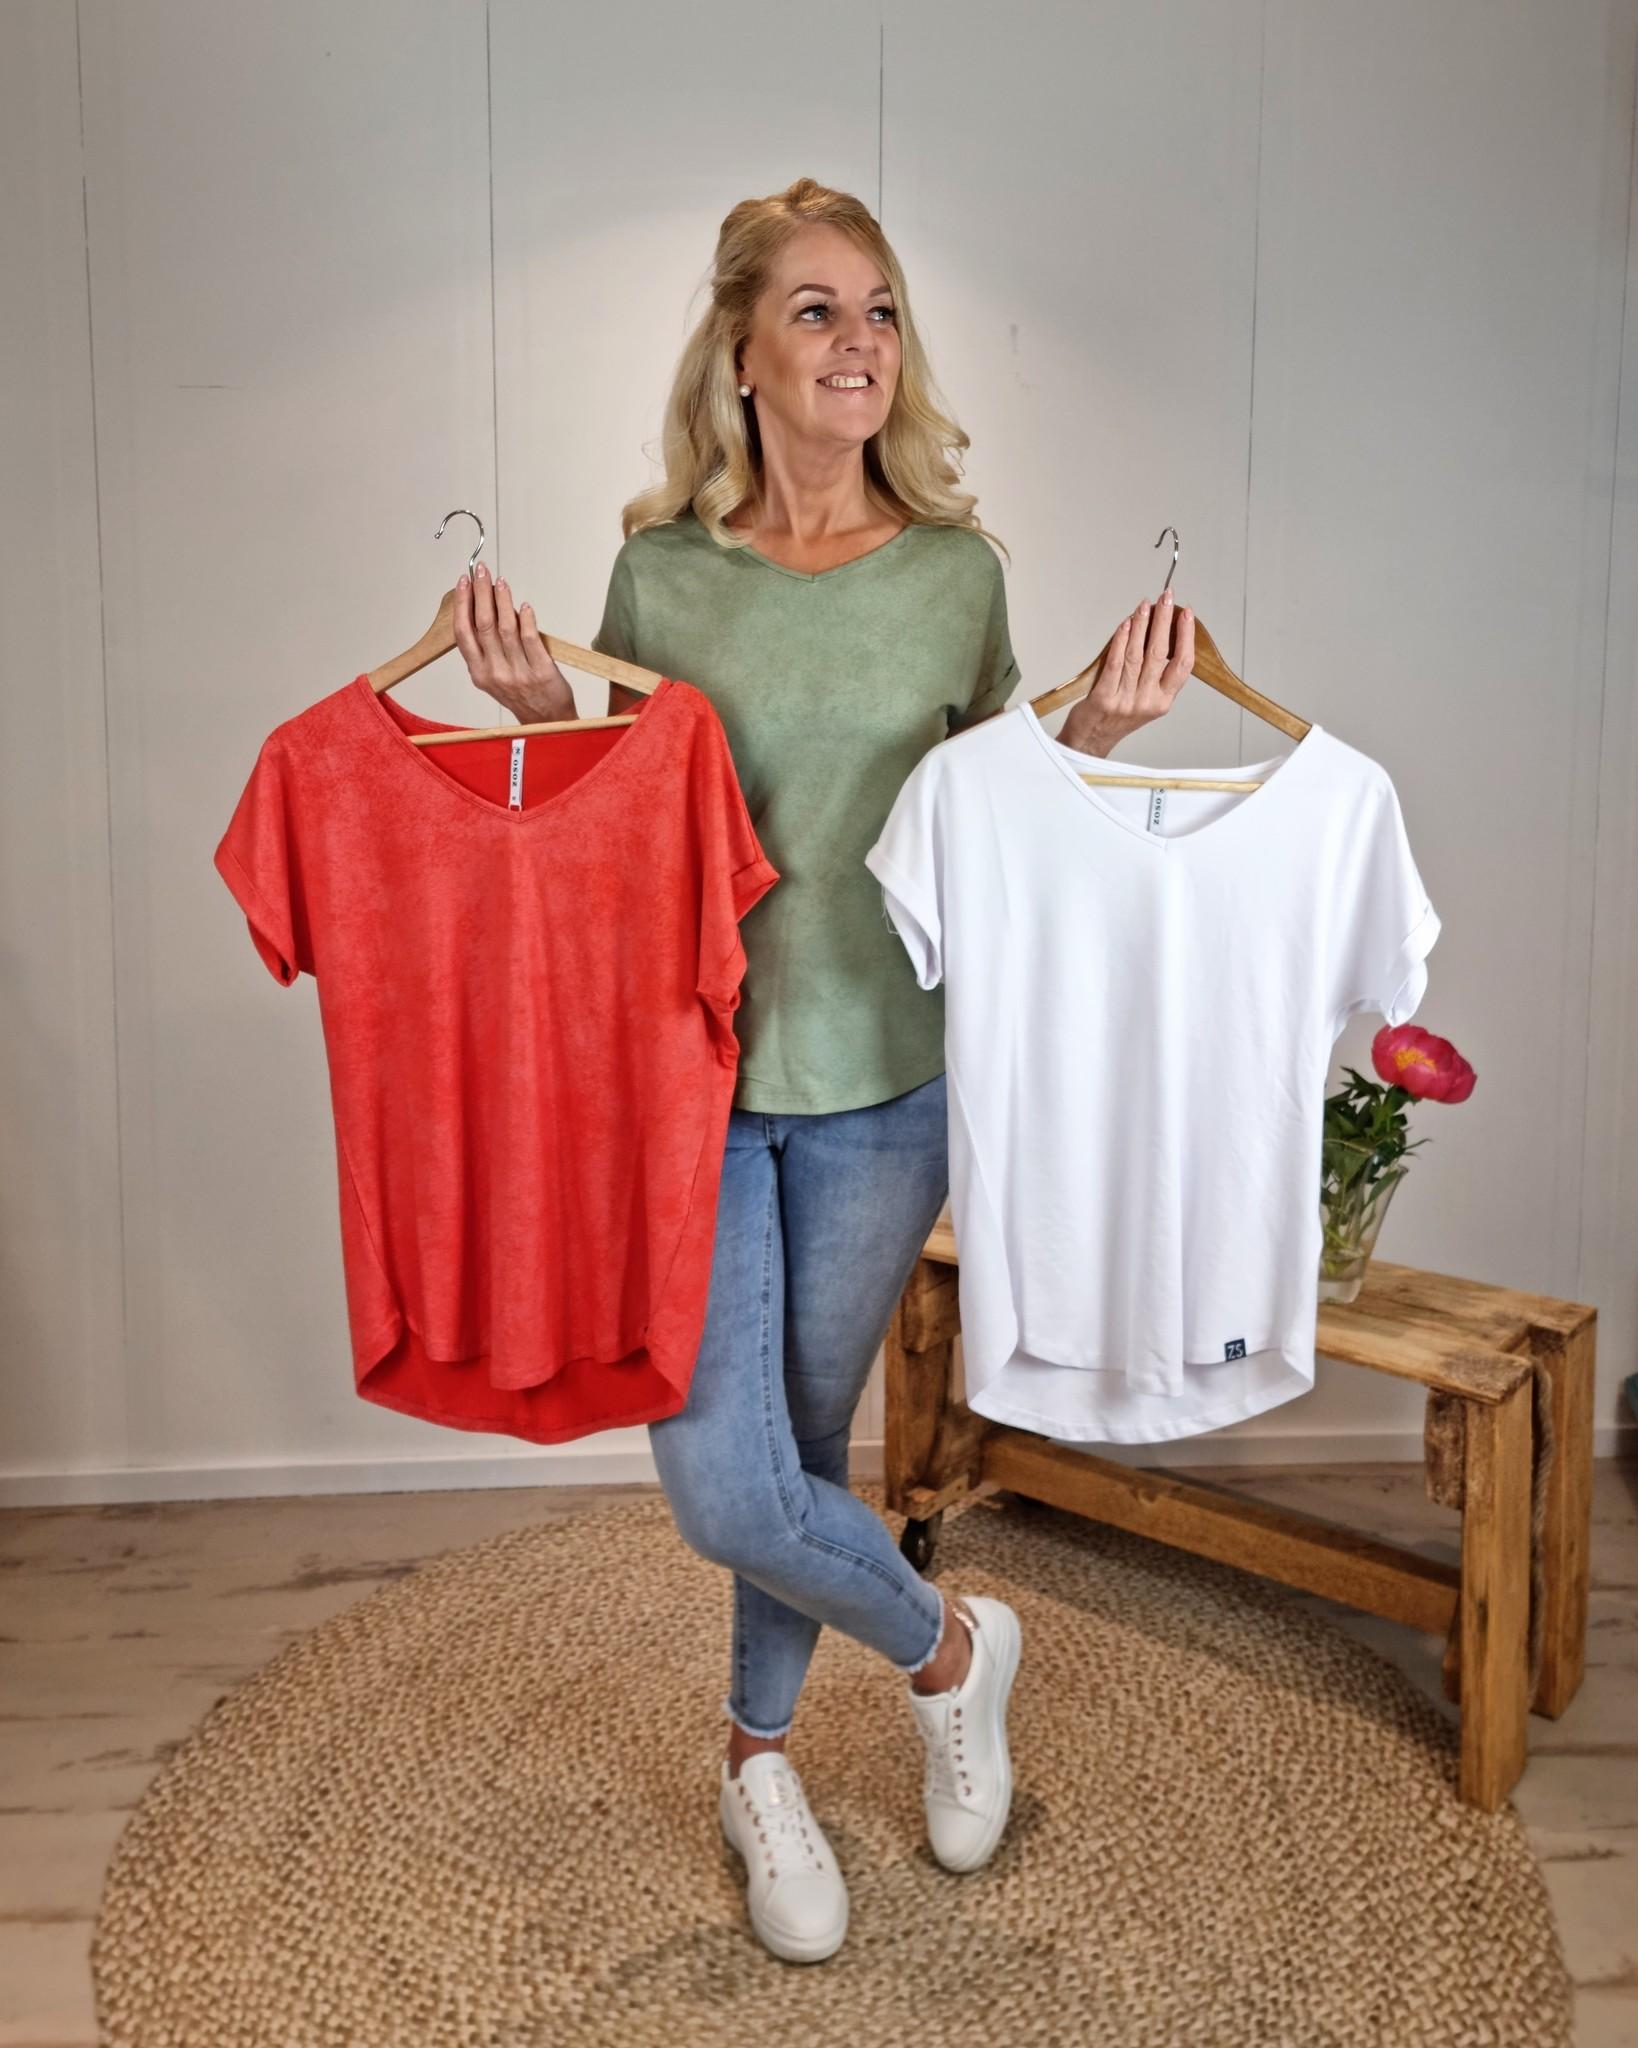 Zoso Zoso Zaza coated shirt